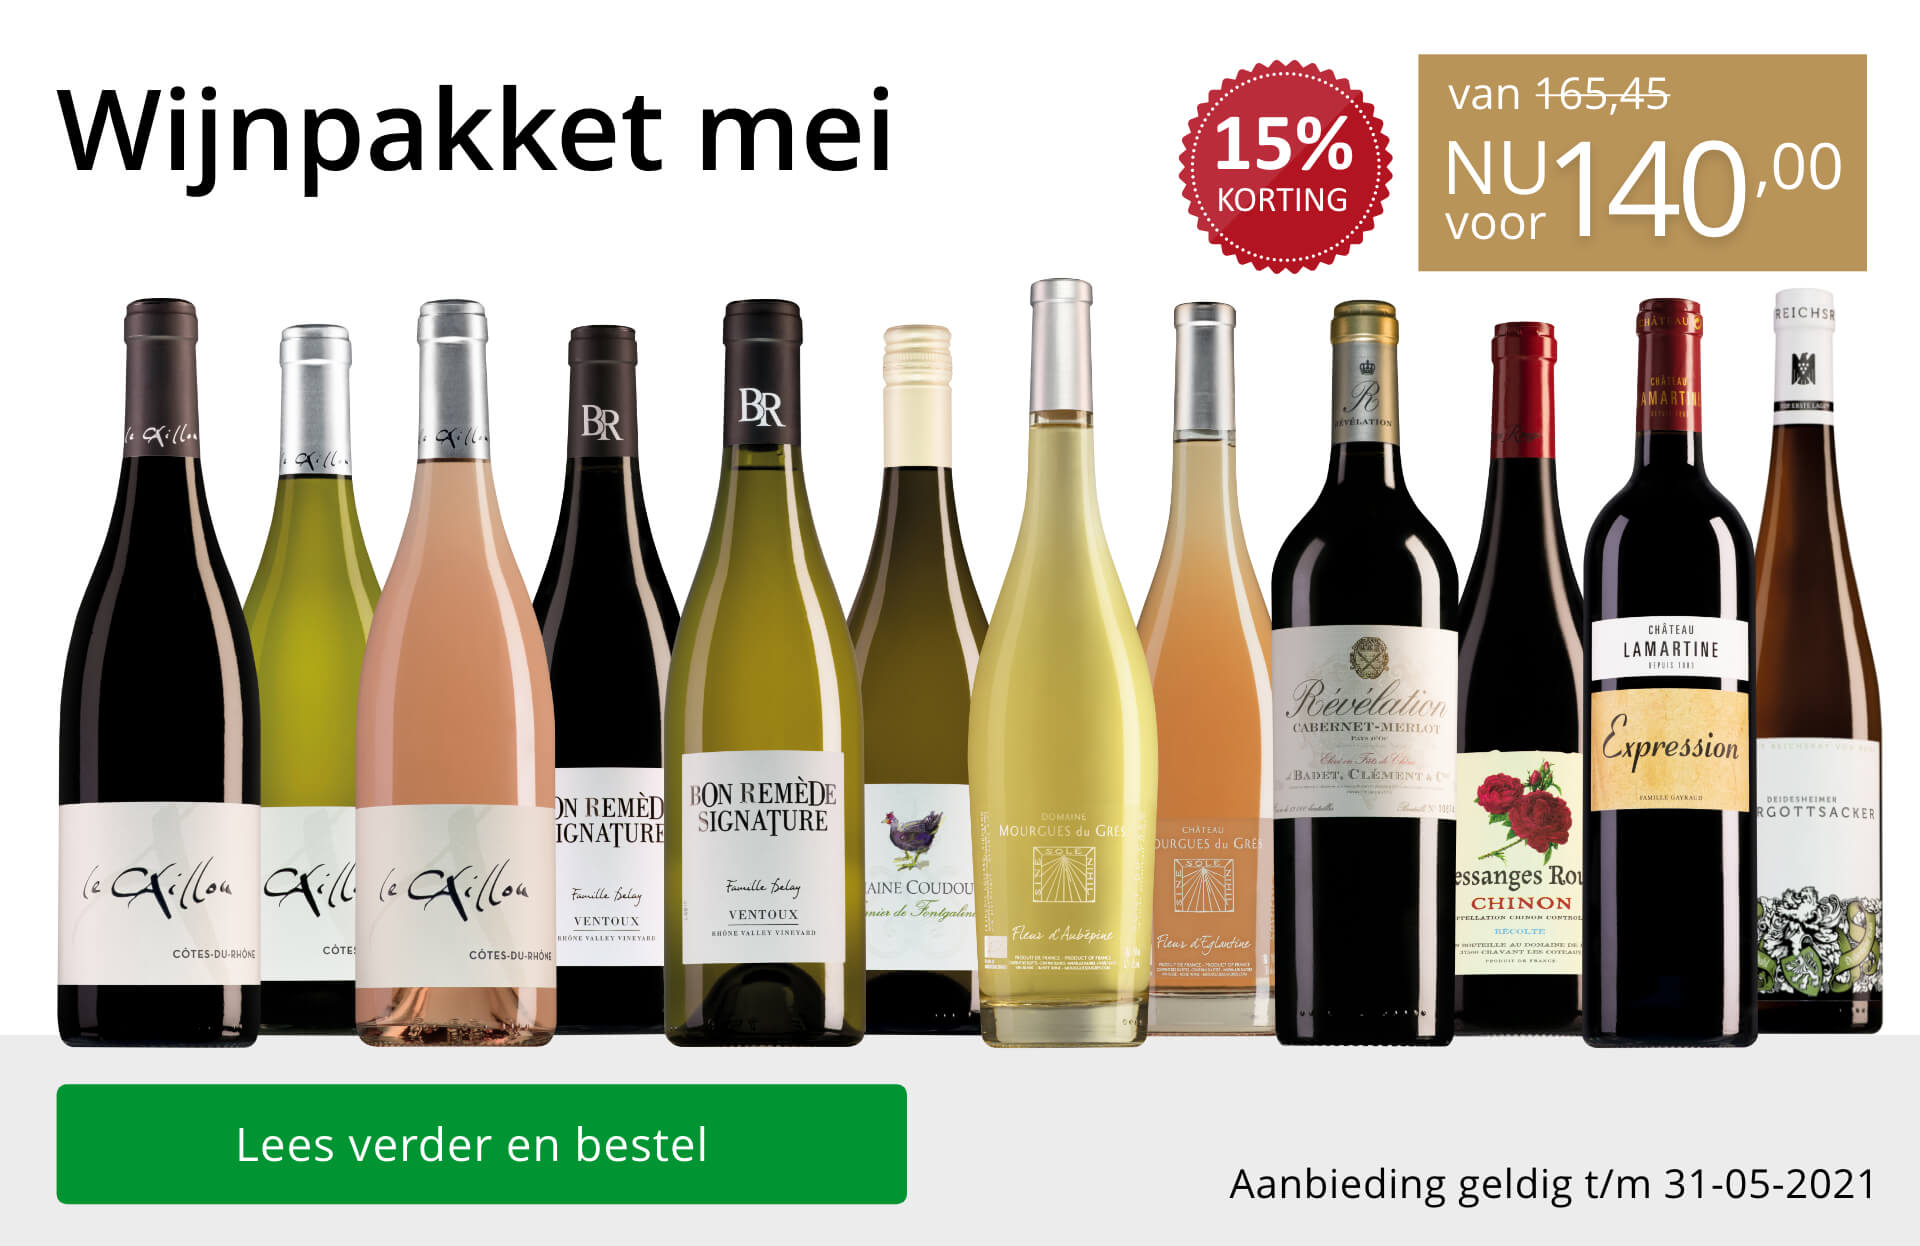 Wijnpakket wijnbericht mei 2021 (140,00) - goud/zwart